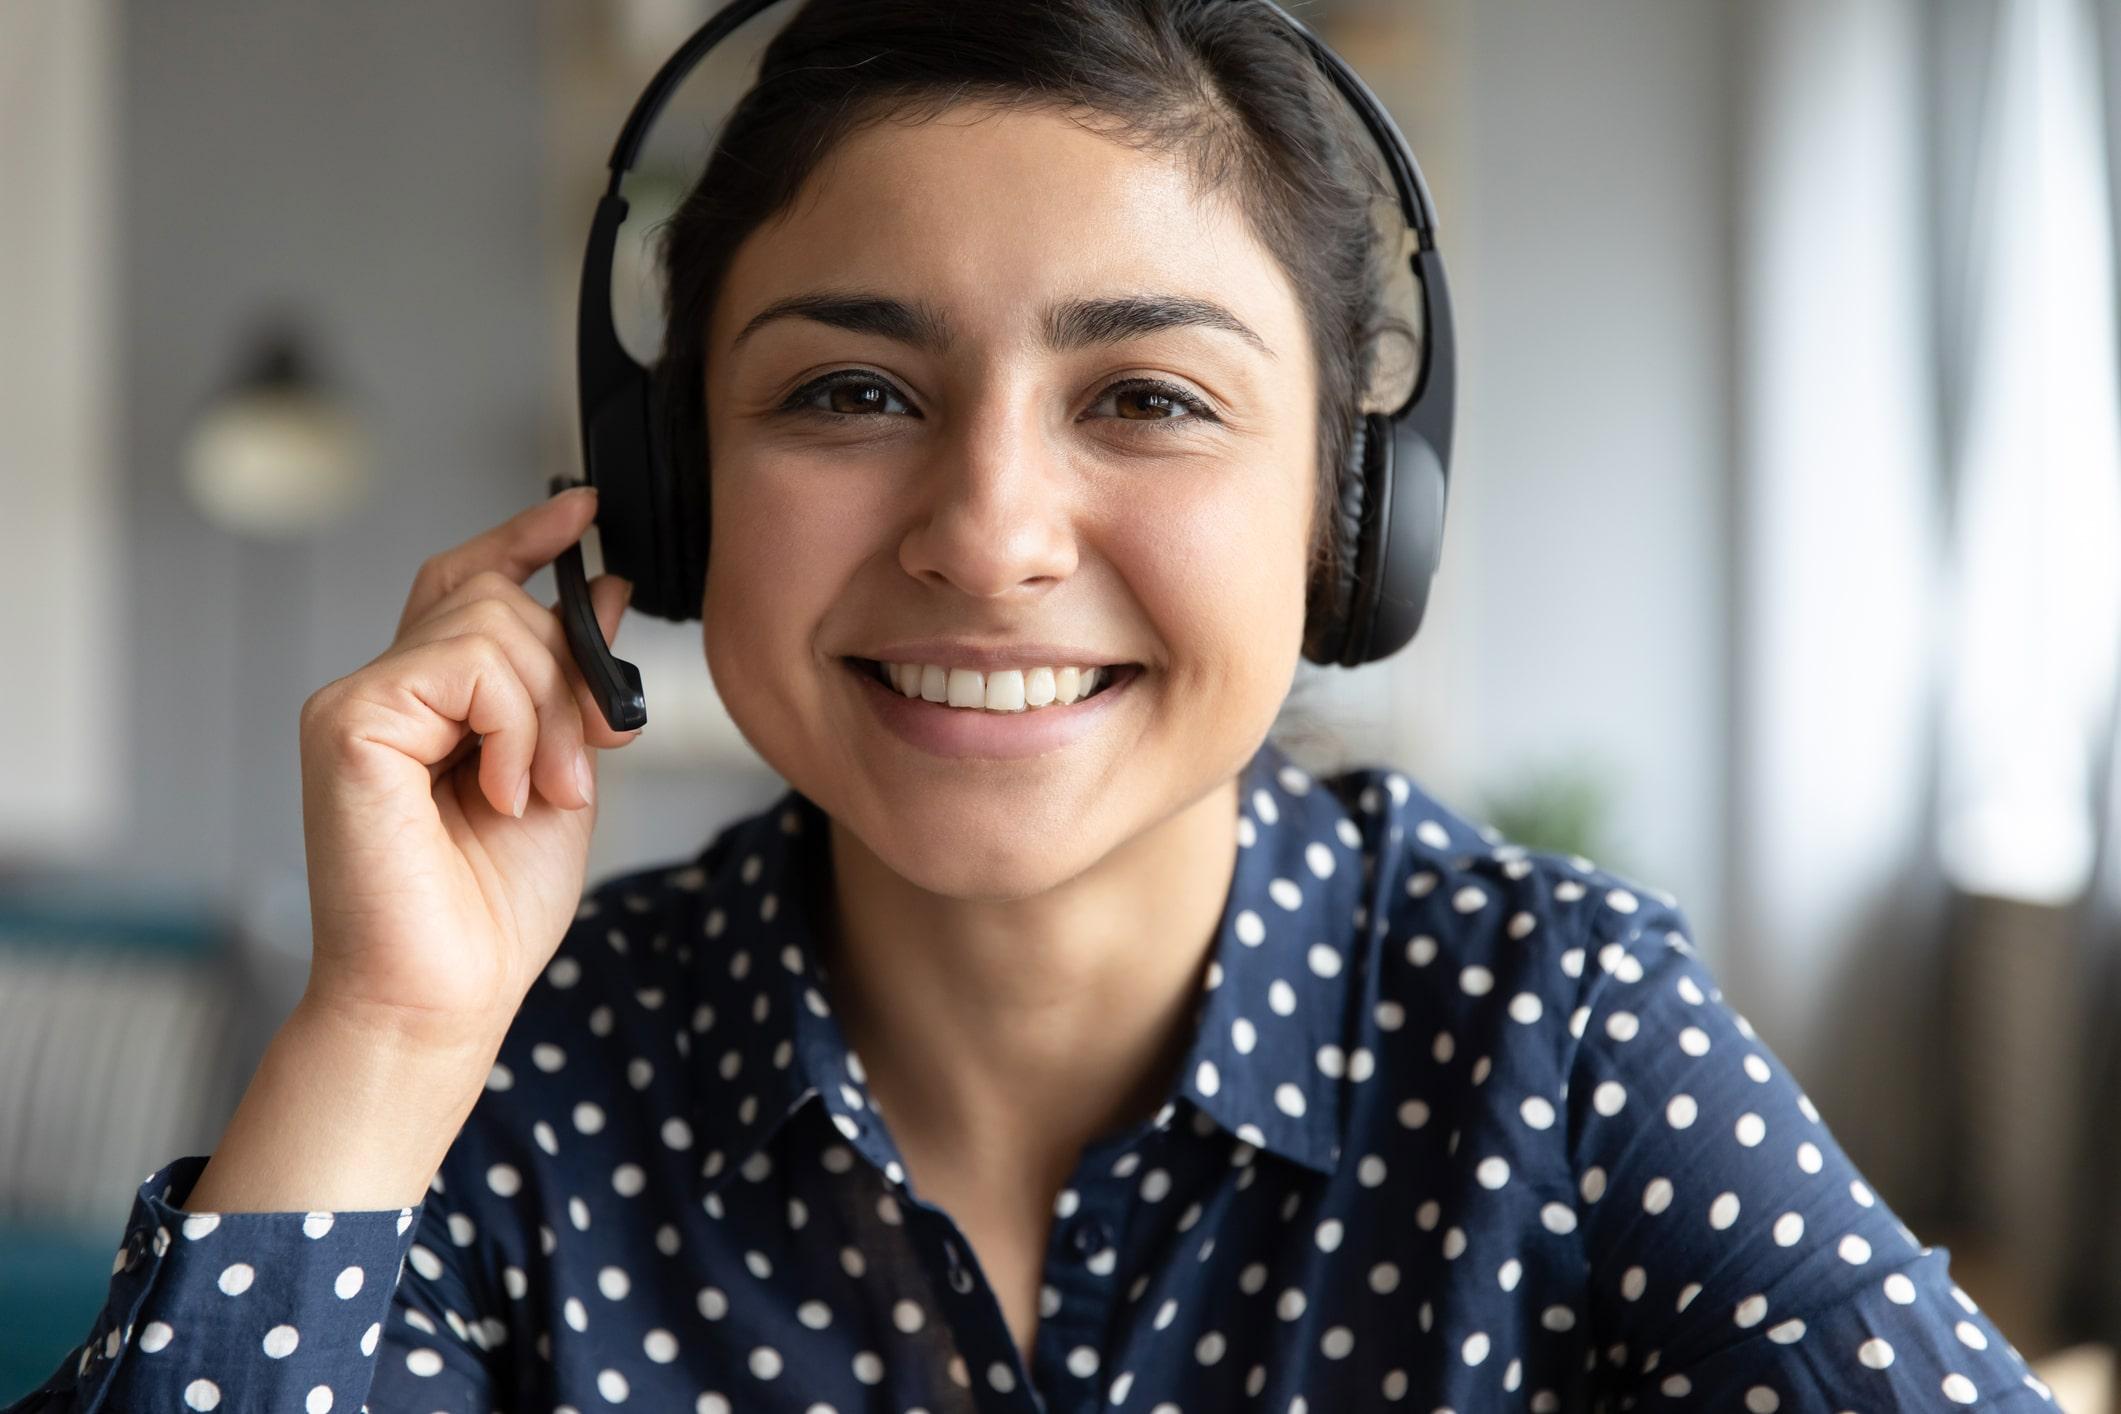 Headshot of woman wearing headset